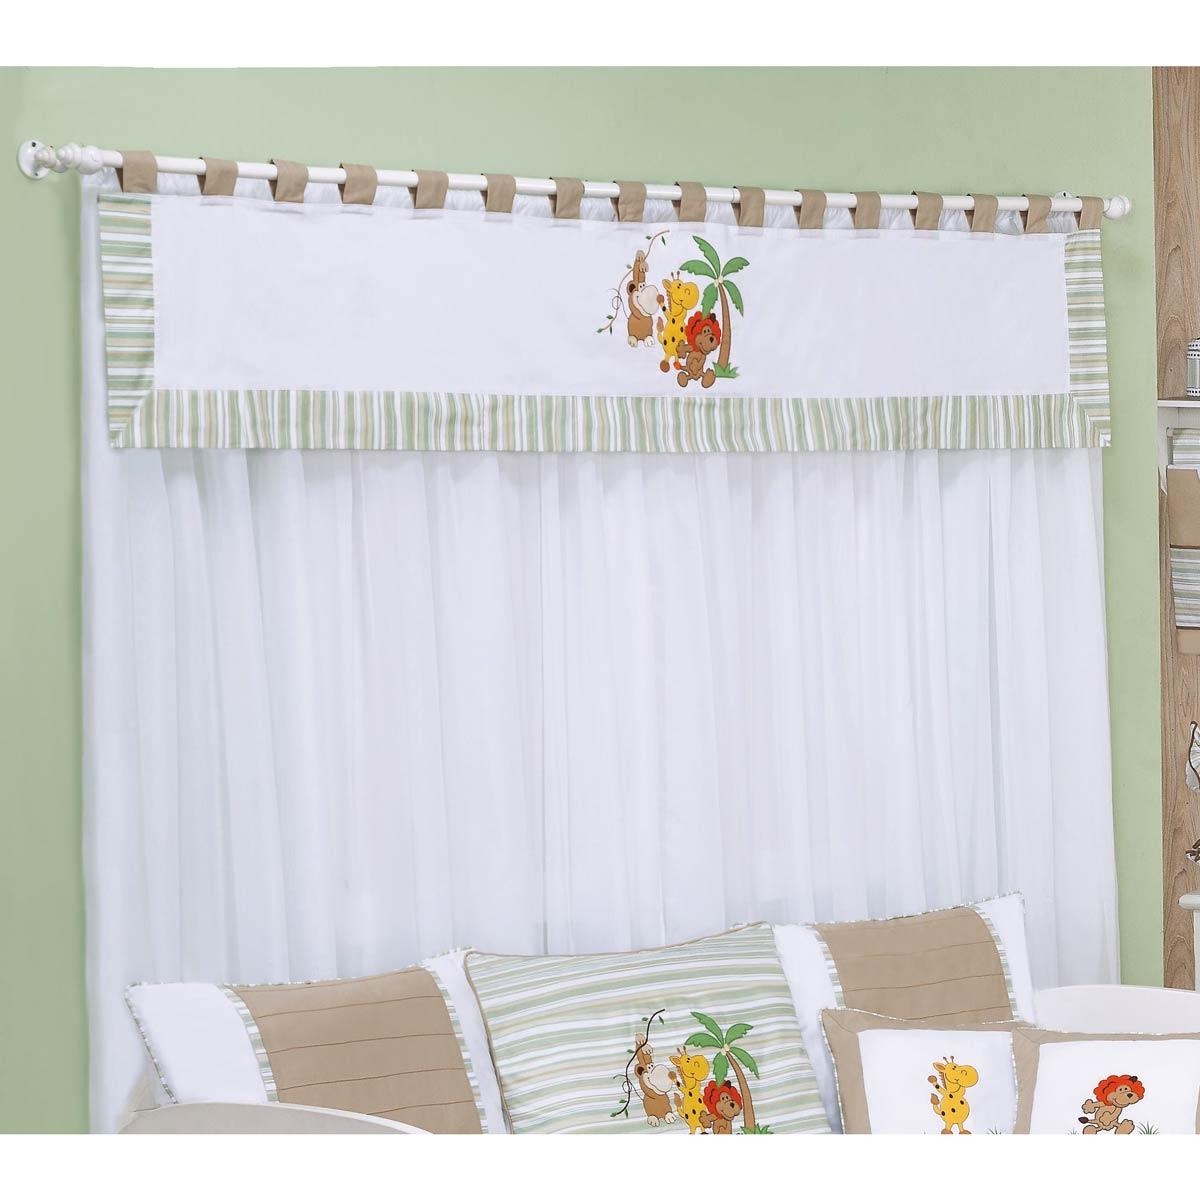 Cortina para quarto de beb listrado cortina para quarto - Cortinas para bebes ...